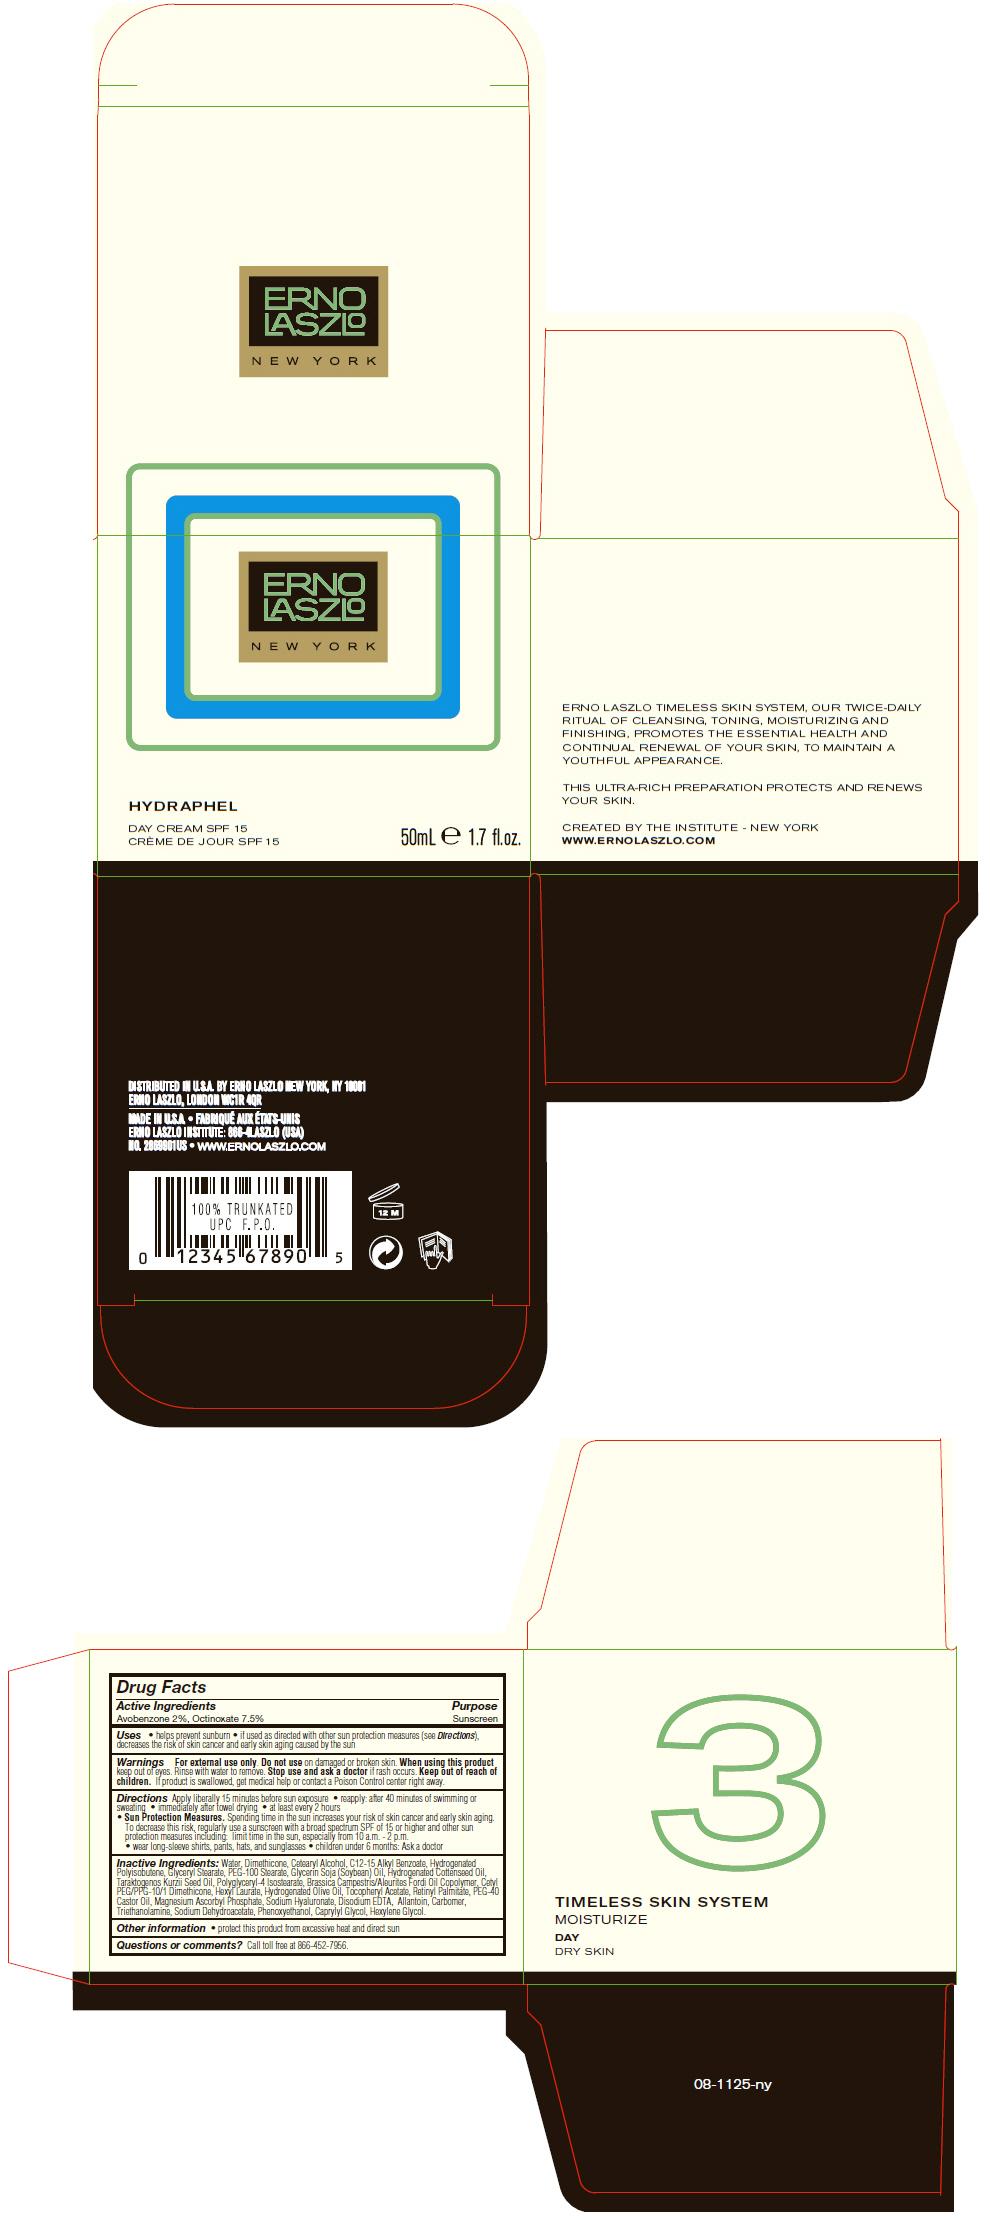 Hydraphel Day Spf15 (Avobenzone And Octinoxate) Cream [Erno Laszlo, Inc.]